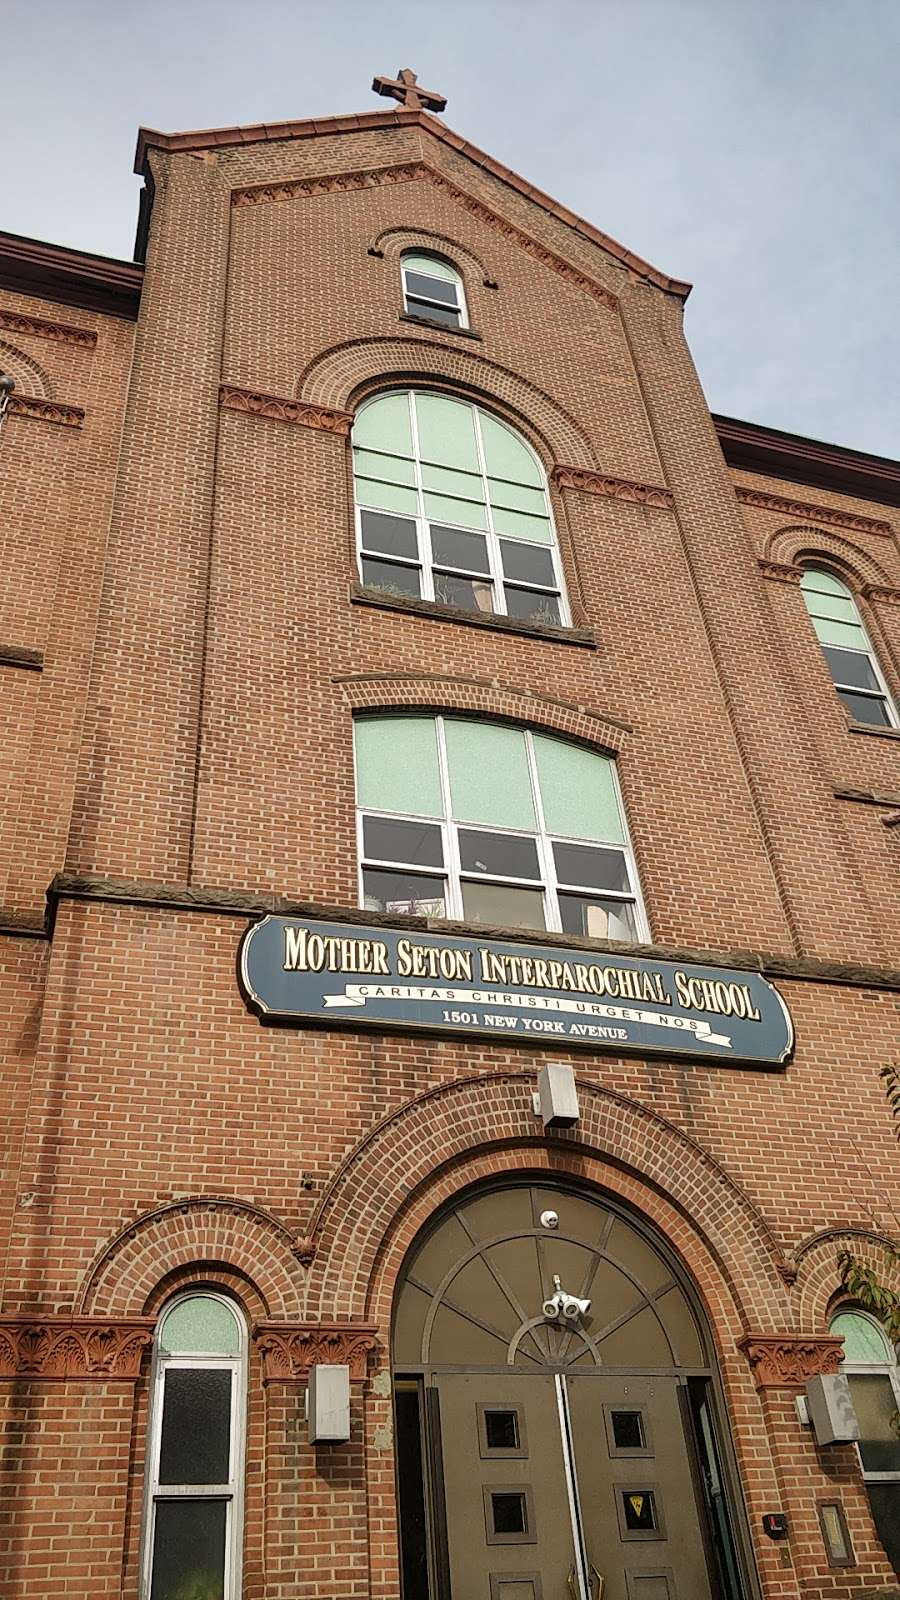 Mother Seton School - school    Photo 2 of 8   Address: 1501 New York Ave, Union City, NJ 07087, USA   Phone: (201) 863-8433